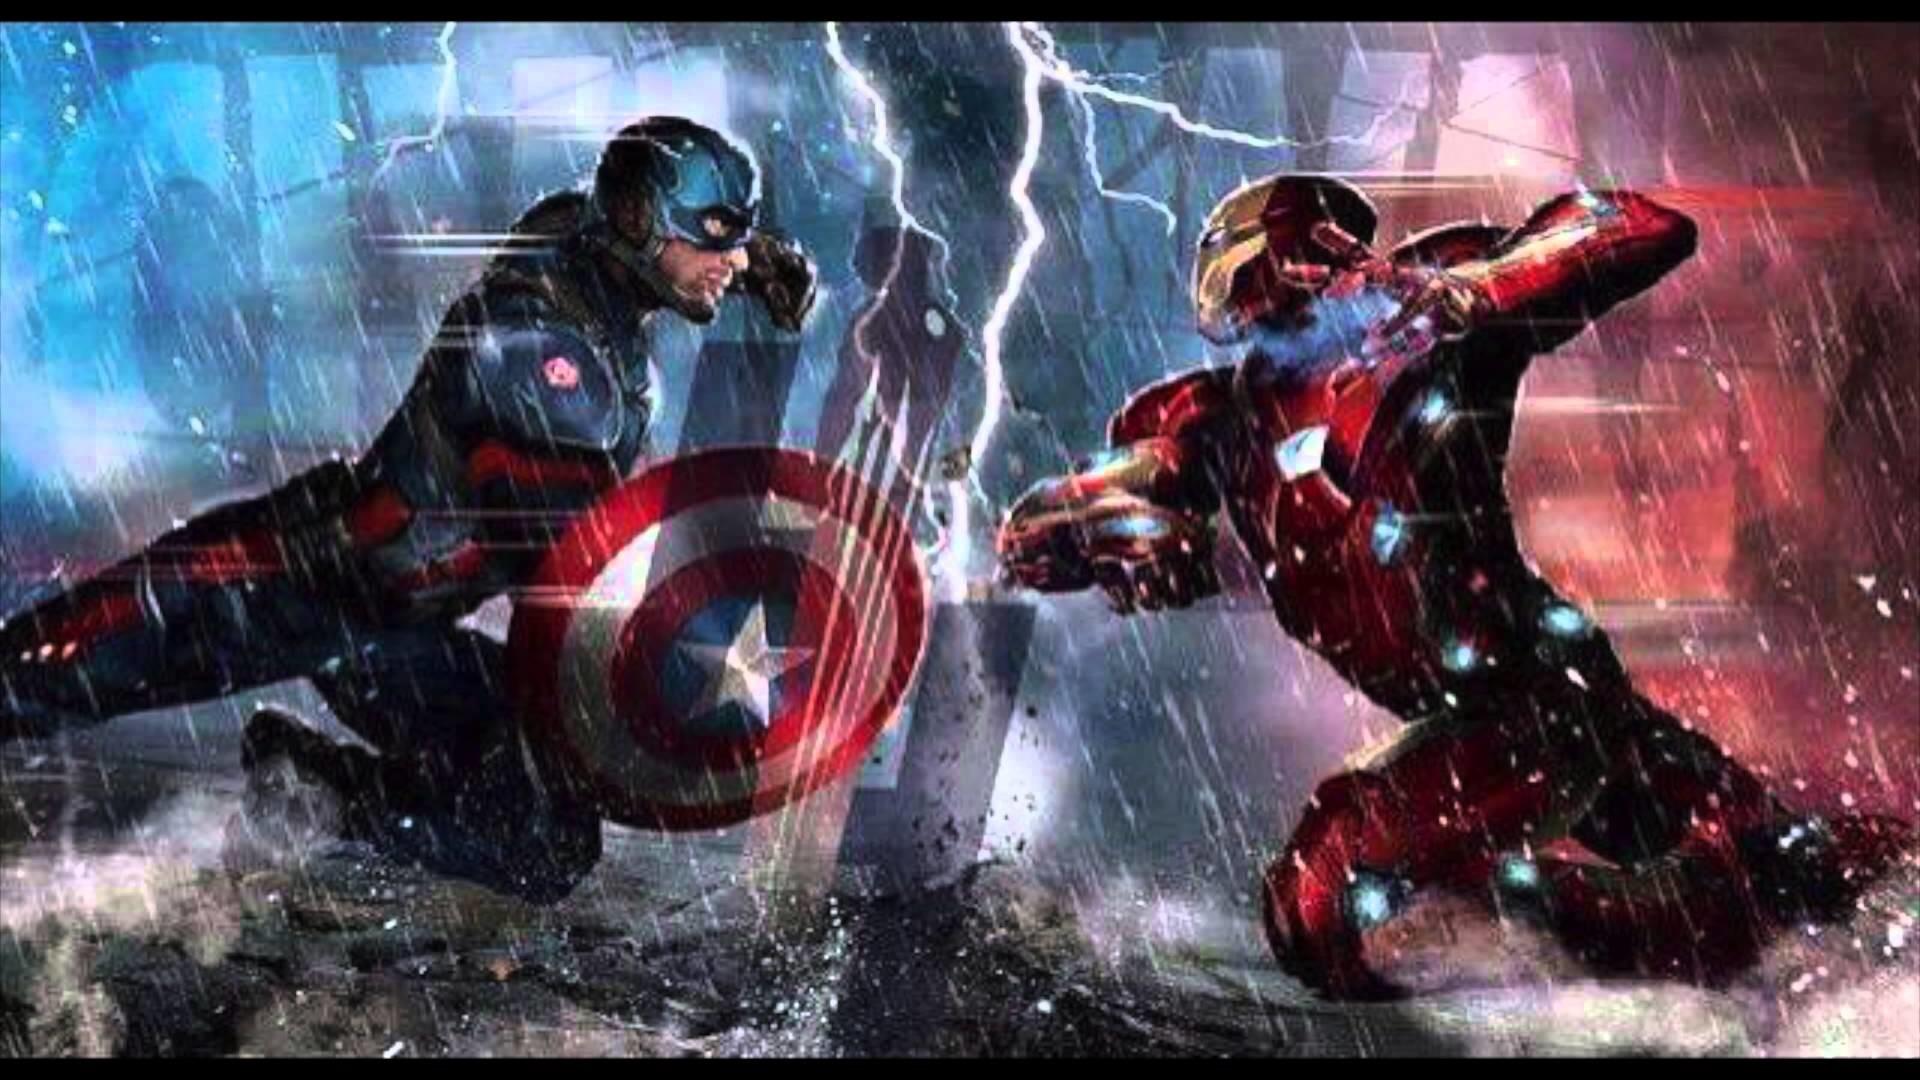 4k captain america wallpaper 62 images - Marvel hd wallpapers 4k ...